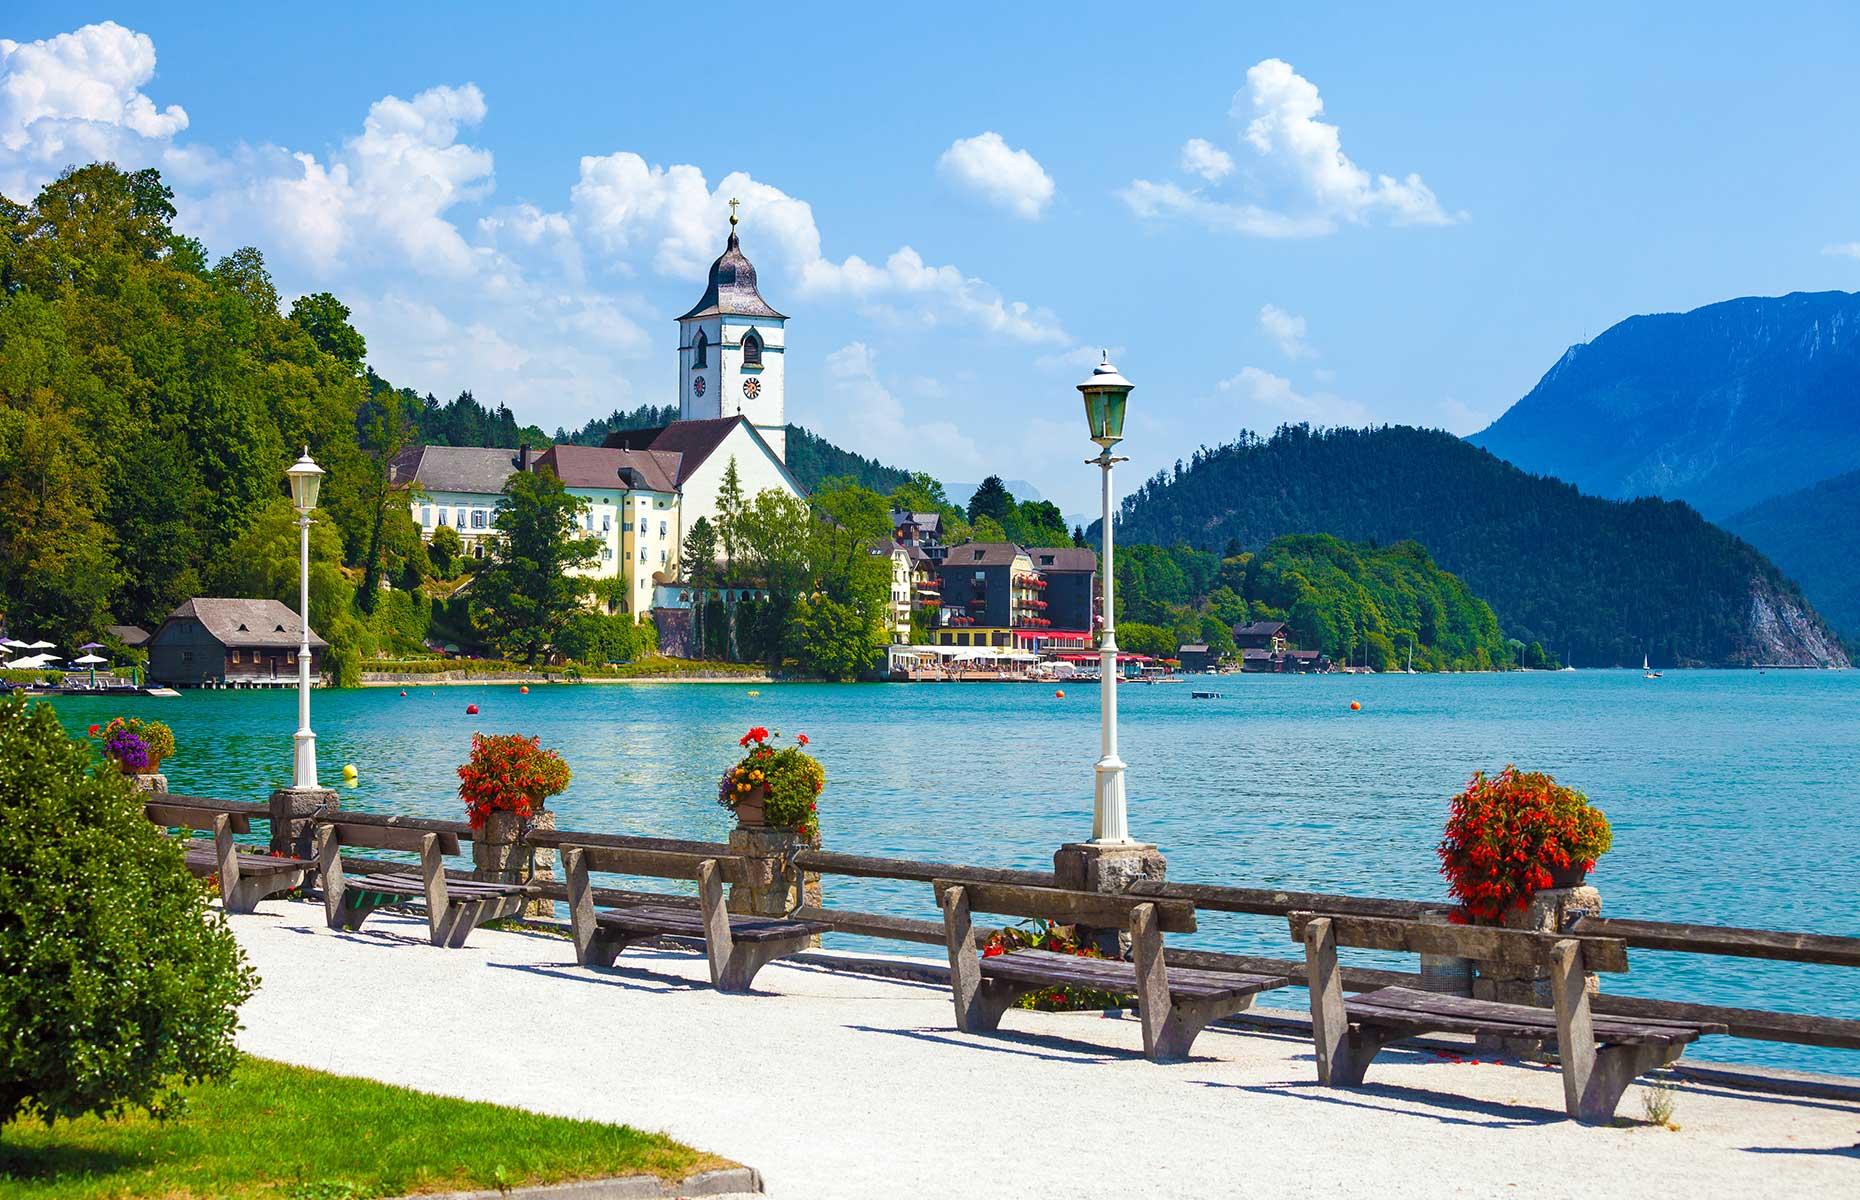 Wolfgangsee, Austria (Image: Pixachi/Shutterstock)